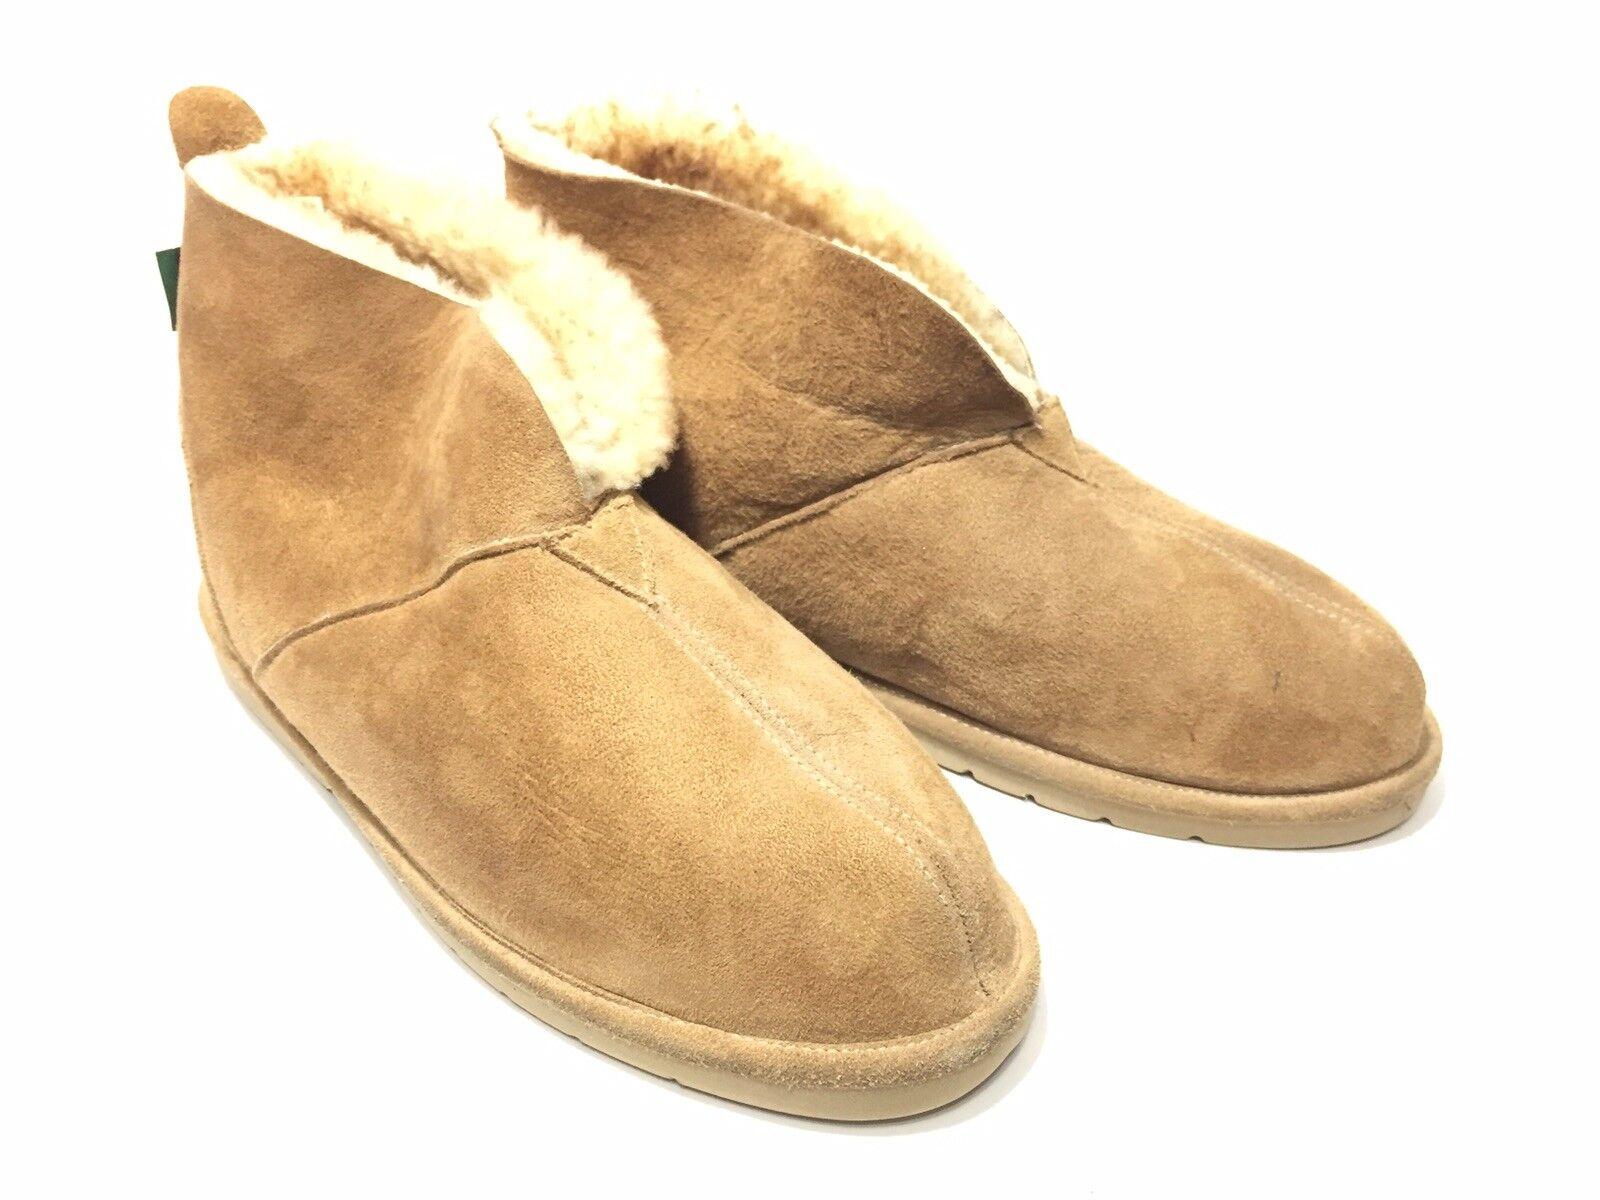 Cabelas Sheepskin Moccasin Slipper Mens 12 M Full Lined Suede Ankle New Zealand